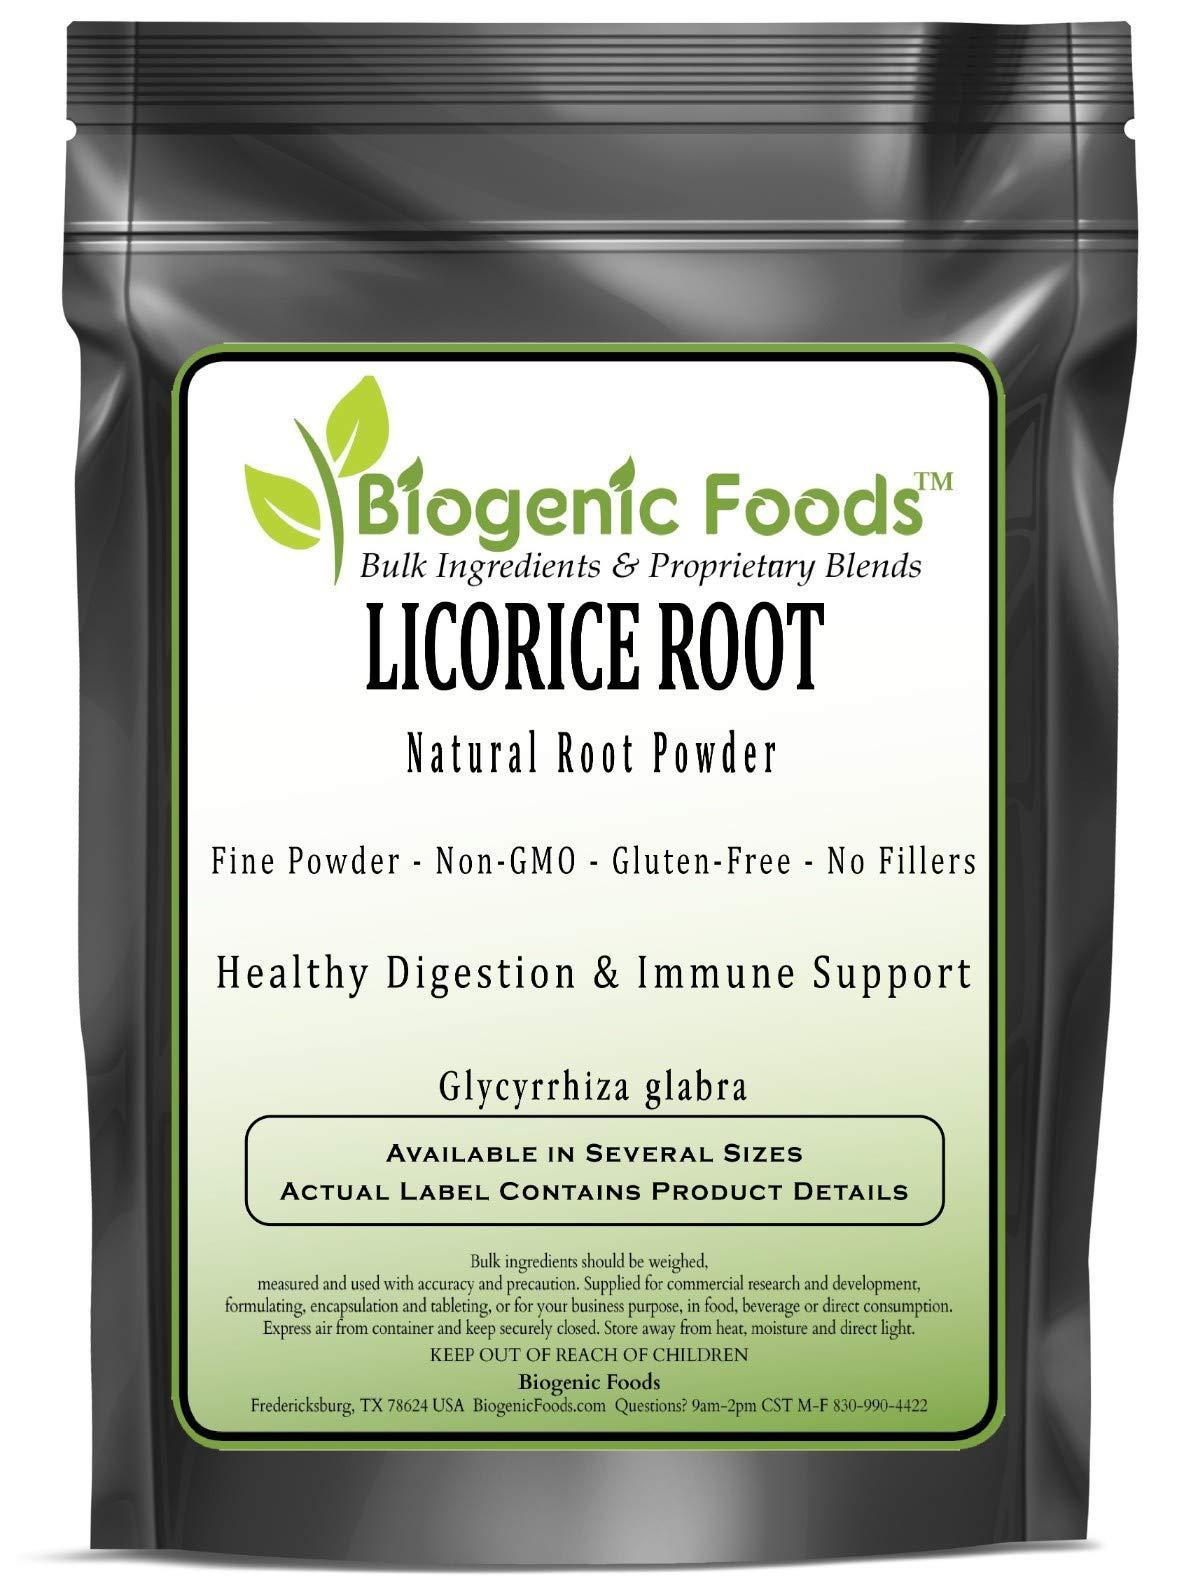 Licorice Root - Natural Root Powder (Glycyrrhiza glabra), 10 kg